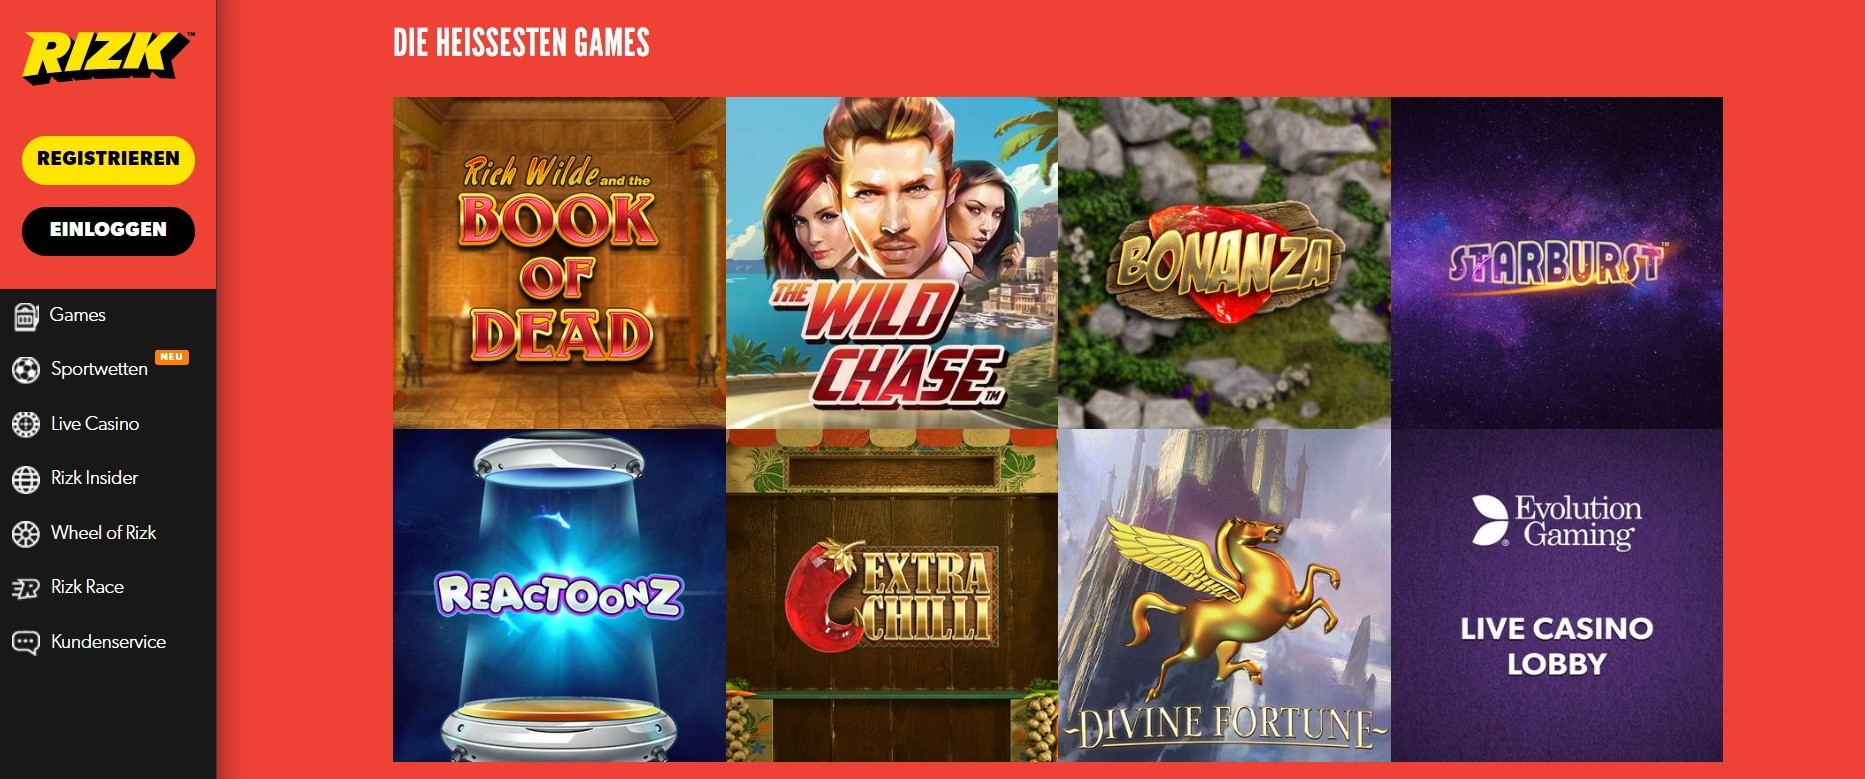 Rizk Casino Top Spiele